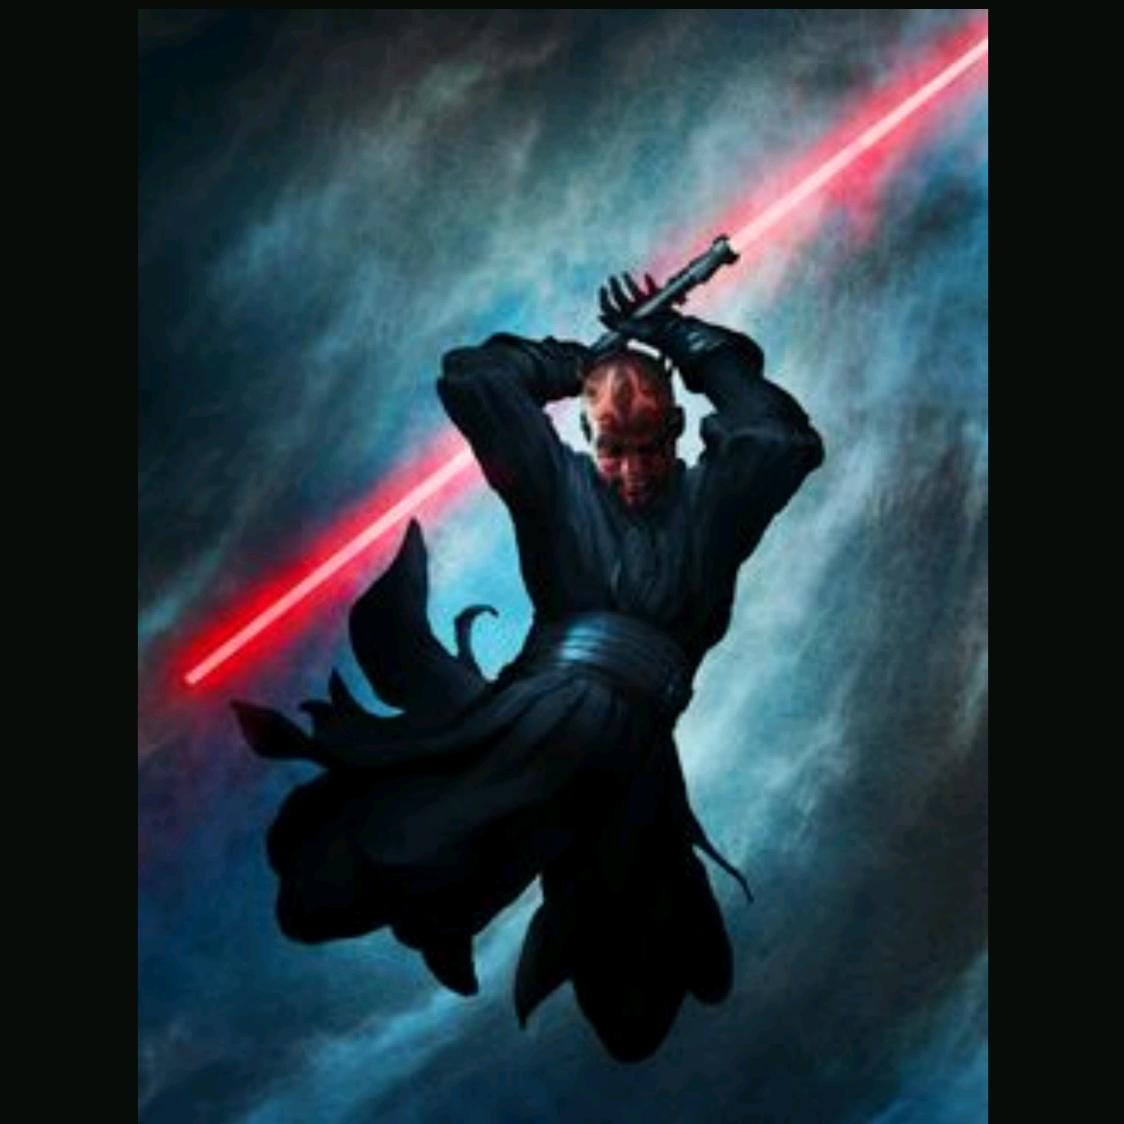 Darth maul der mächtige's avatar